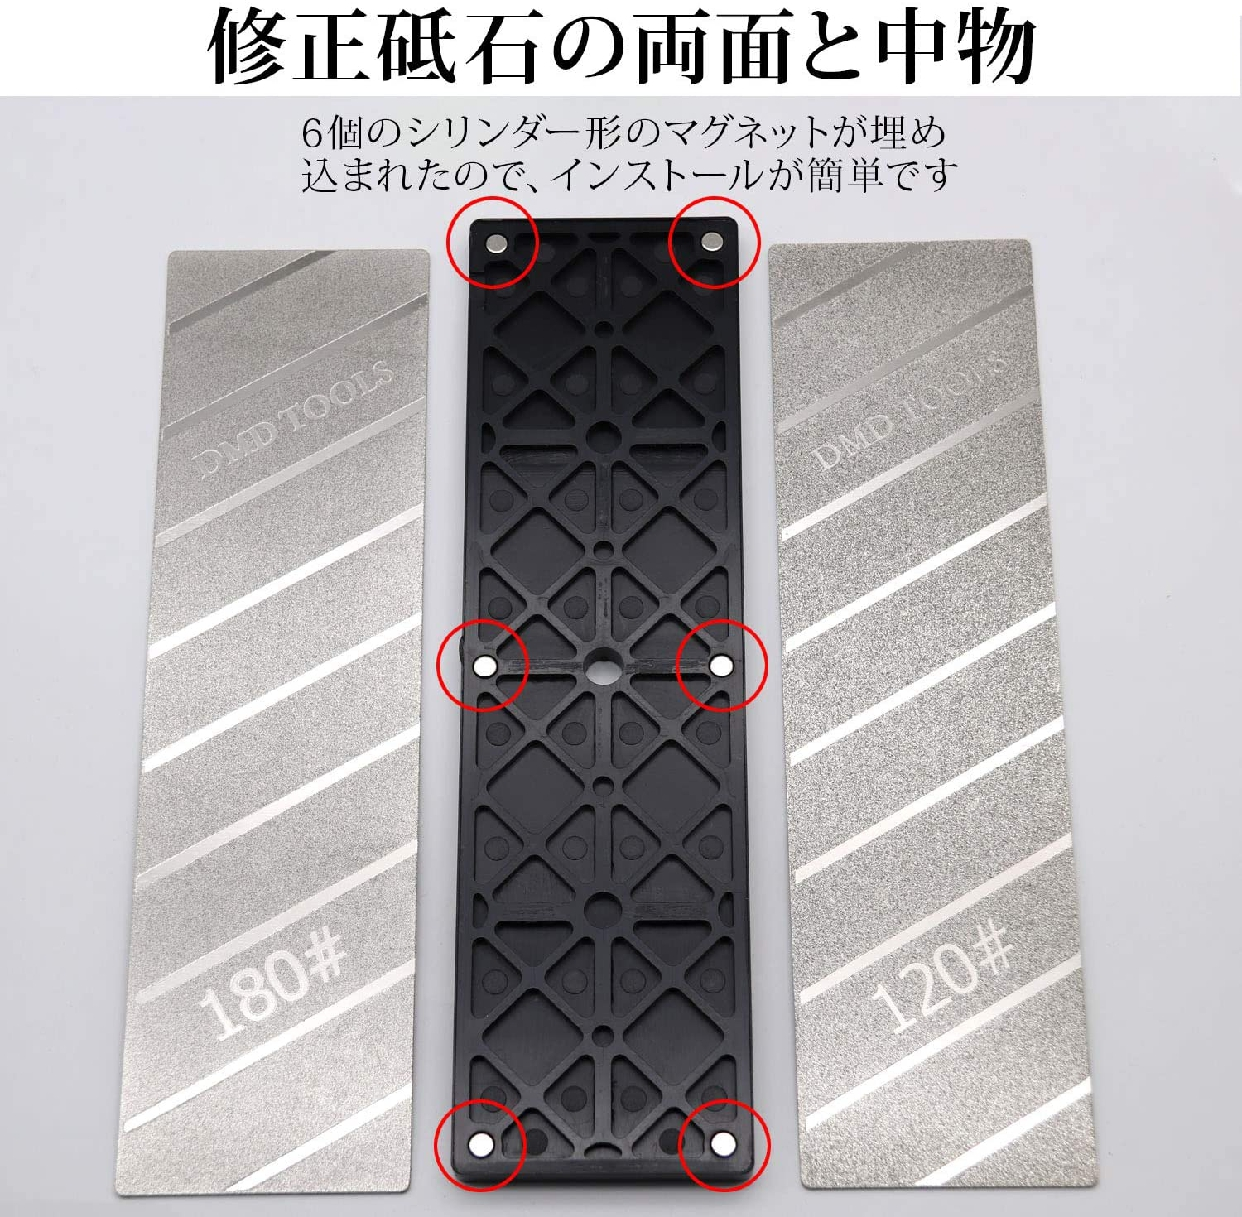 GOKEI 面直し用砥石 両面2役タイプ #180/#120 258×75×13mmの商品画像3